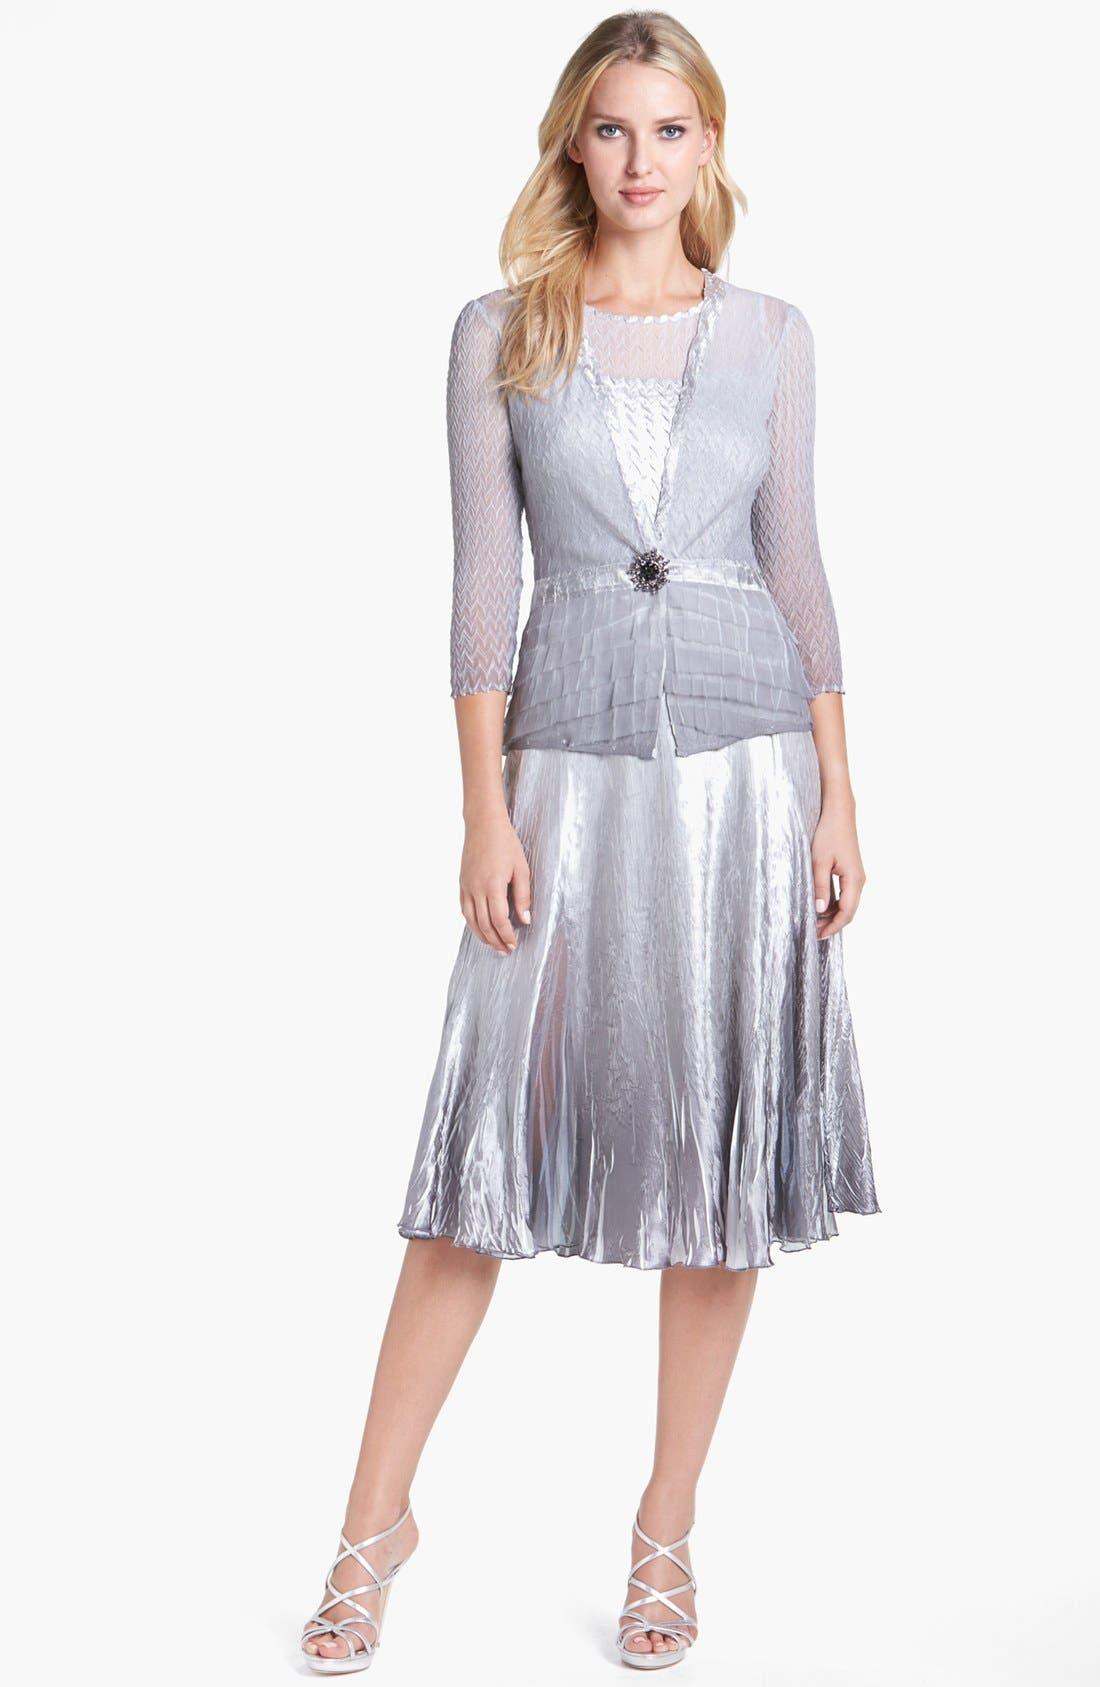 Alternate Image 1 Selected - Komarov Pleated Charmeuse Dress & Chiffon Jacket